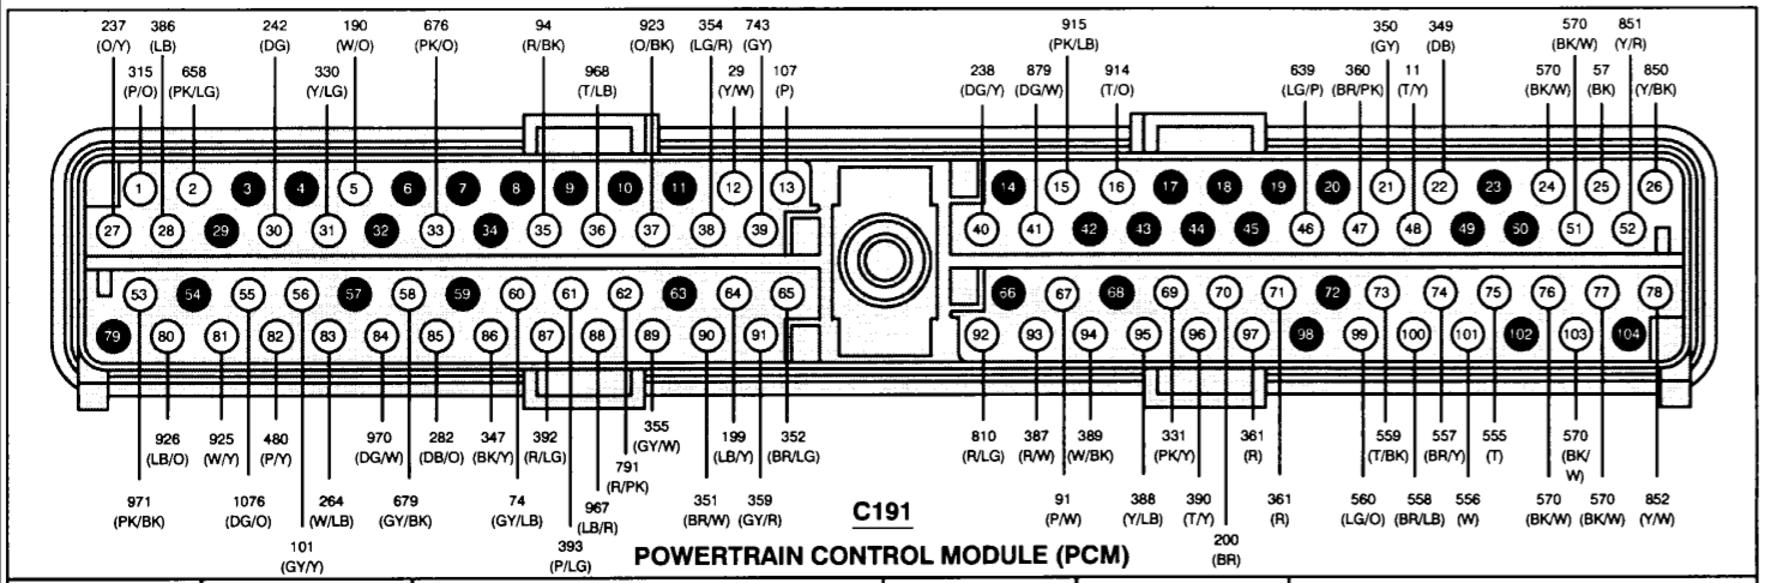 3d0fe0e8-eabc-4f0a-9bd5-7c54c52ed62b_PCM connector.png